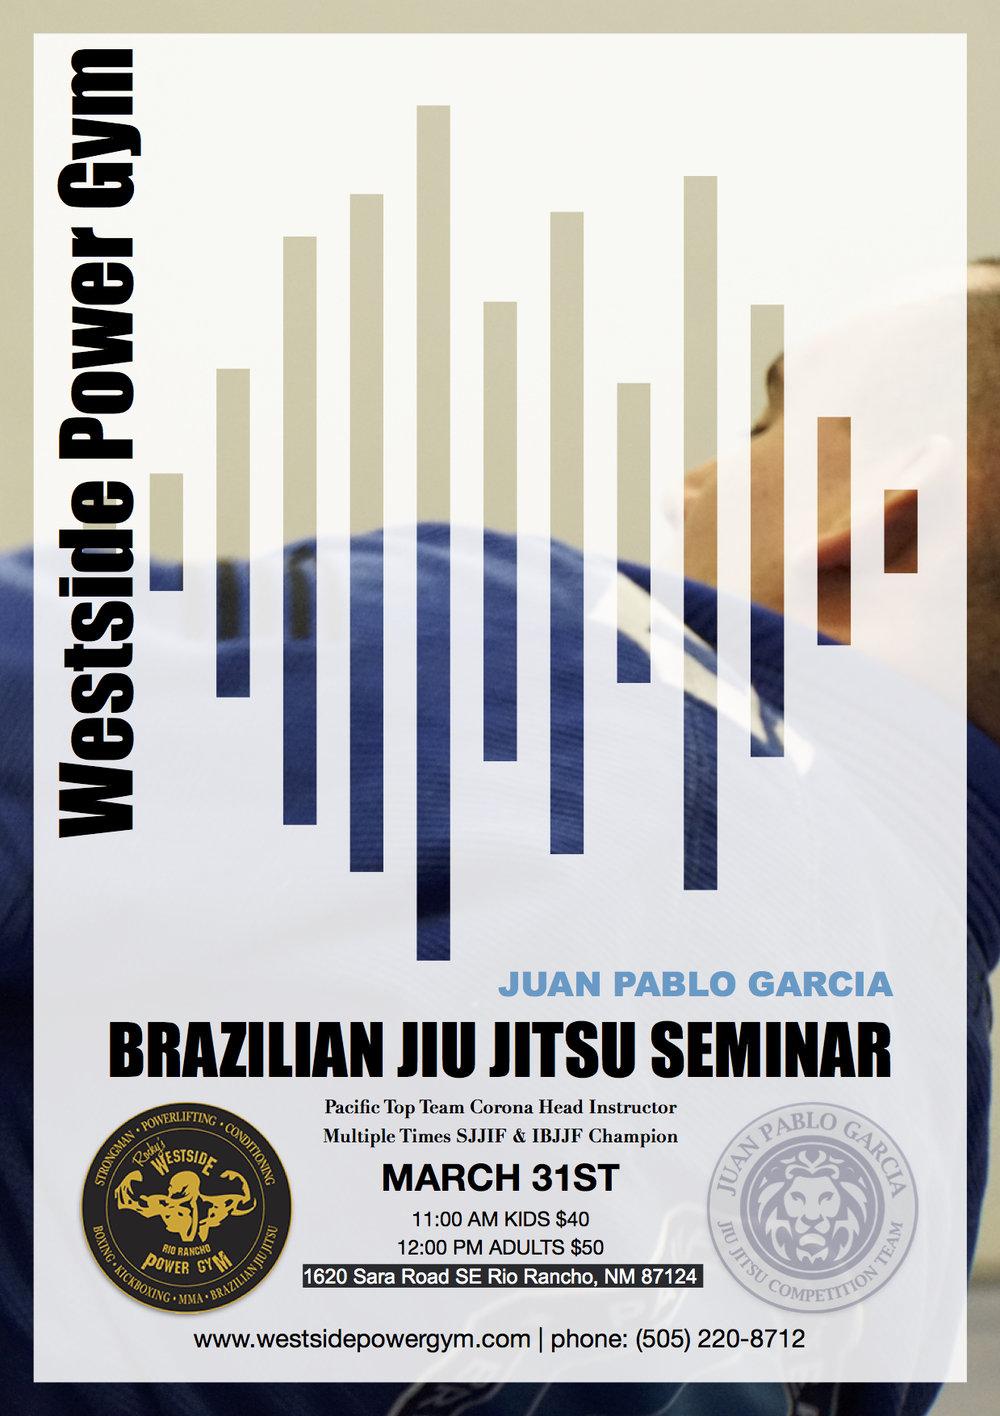 Brazilian Jiu Jitsu Seminar